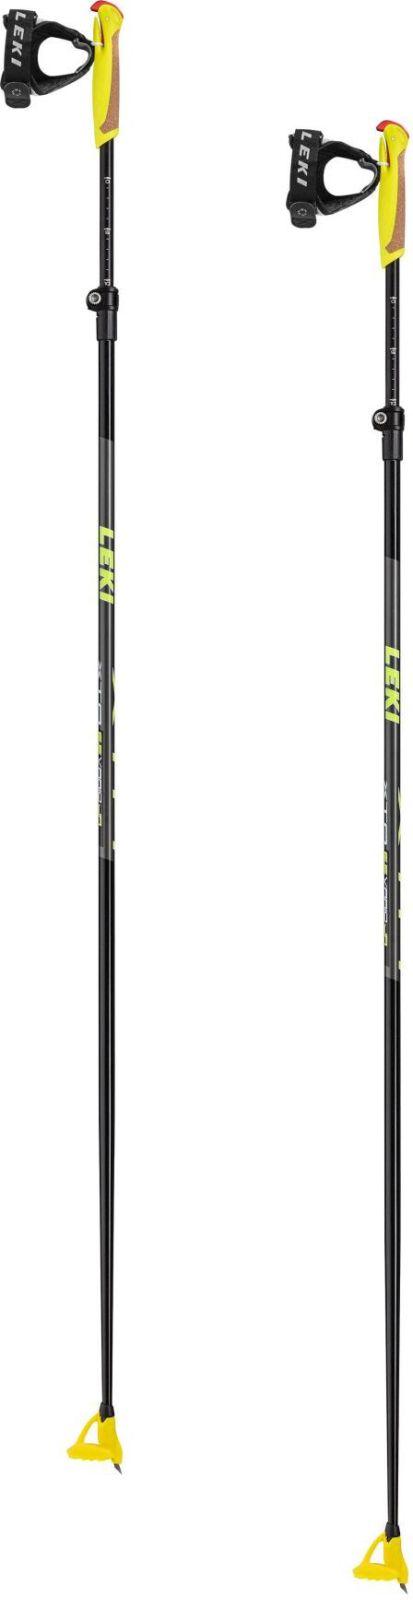 Leki XTA 6.5 Vario Jr. - black/neonyellow/darkanthracite 125-145